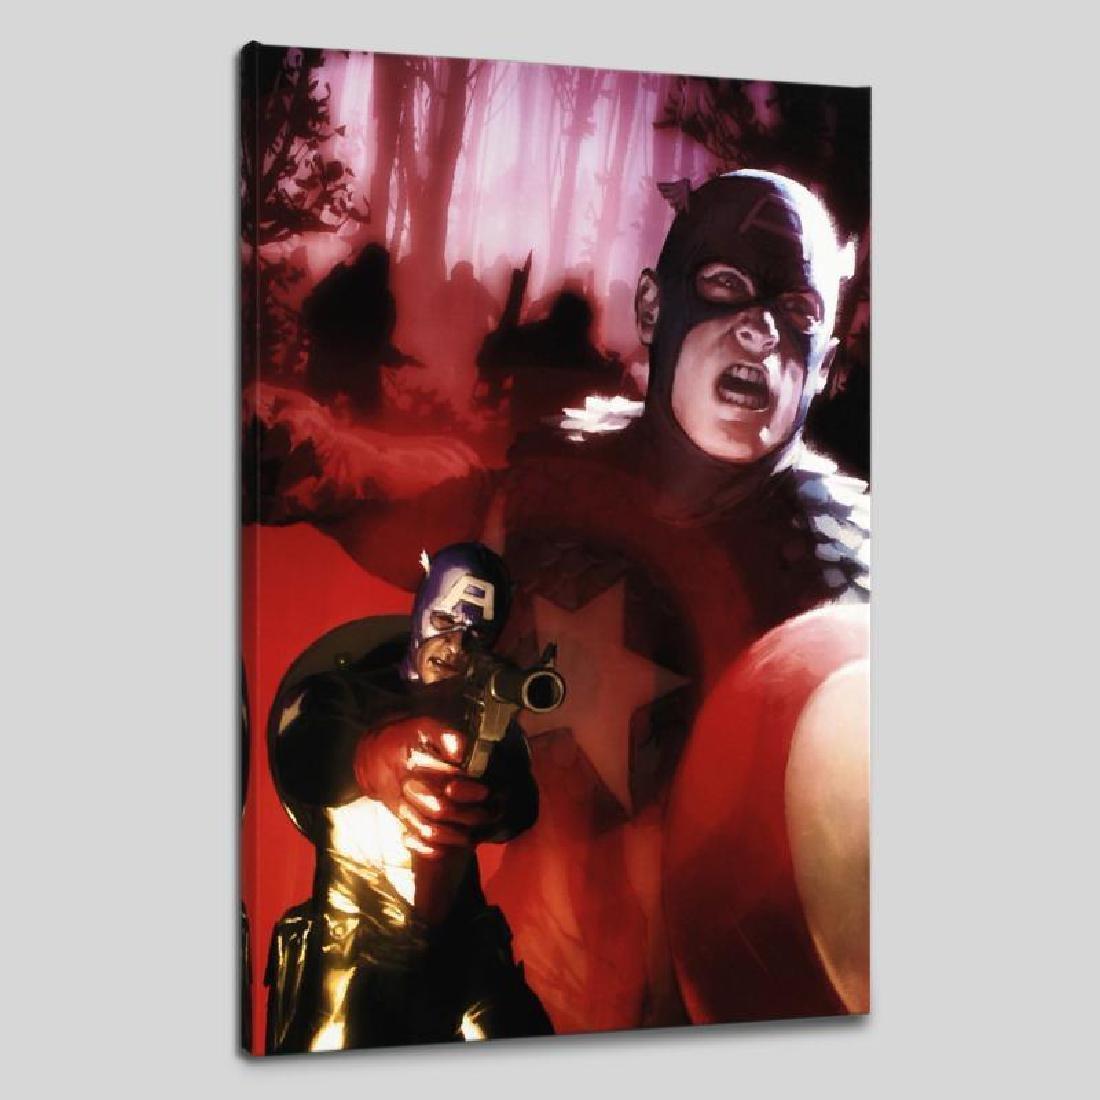 Captain America #603 by Marvel Comics - 3